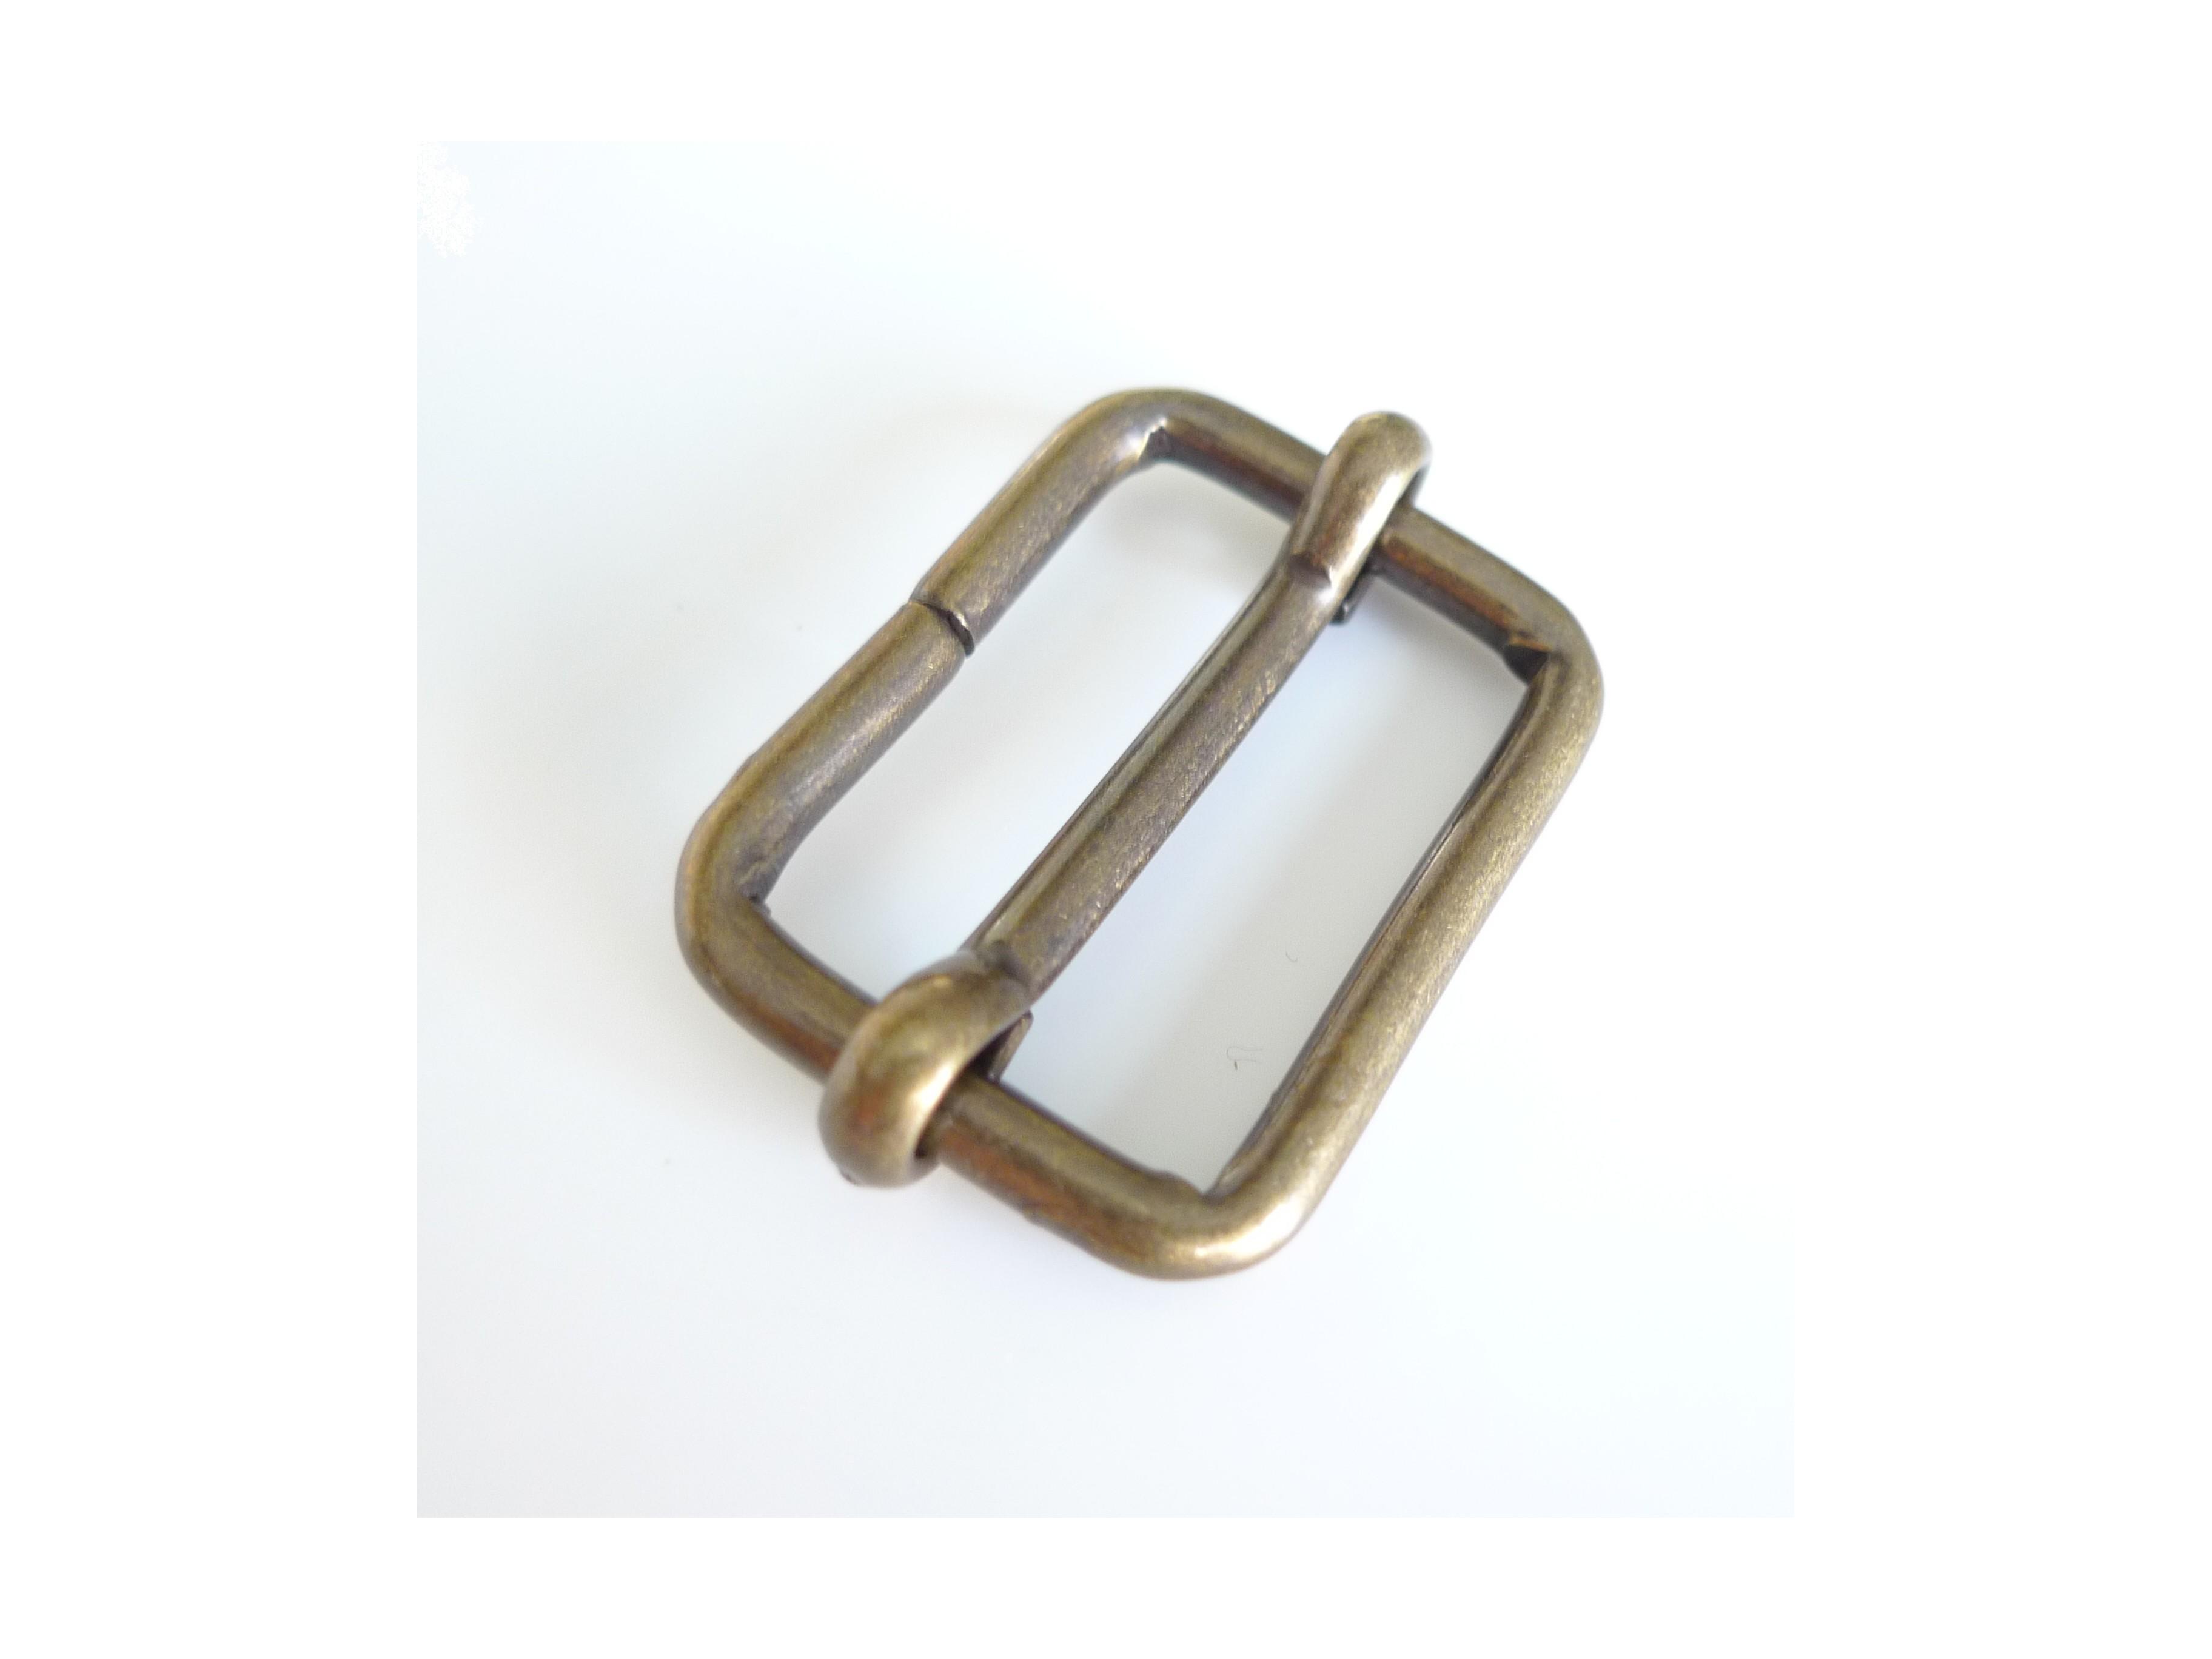 1ddc12880f18 Boucle coulissante bronze 30 mm - Mercerie